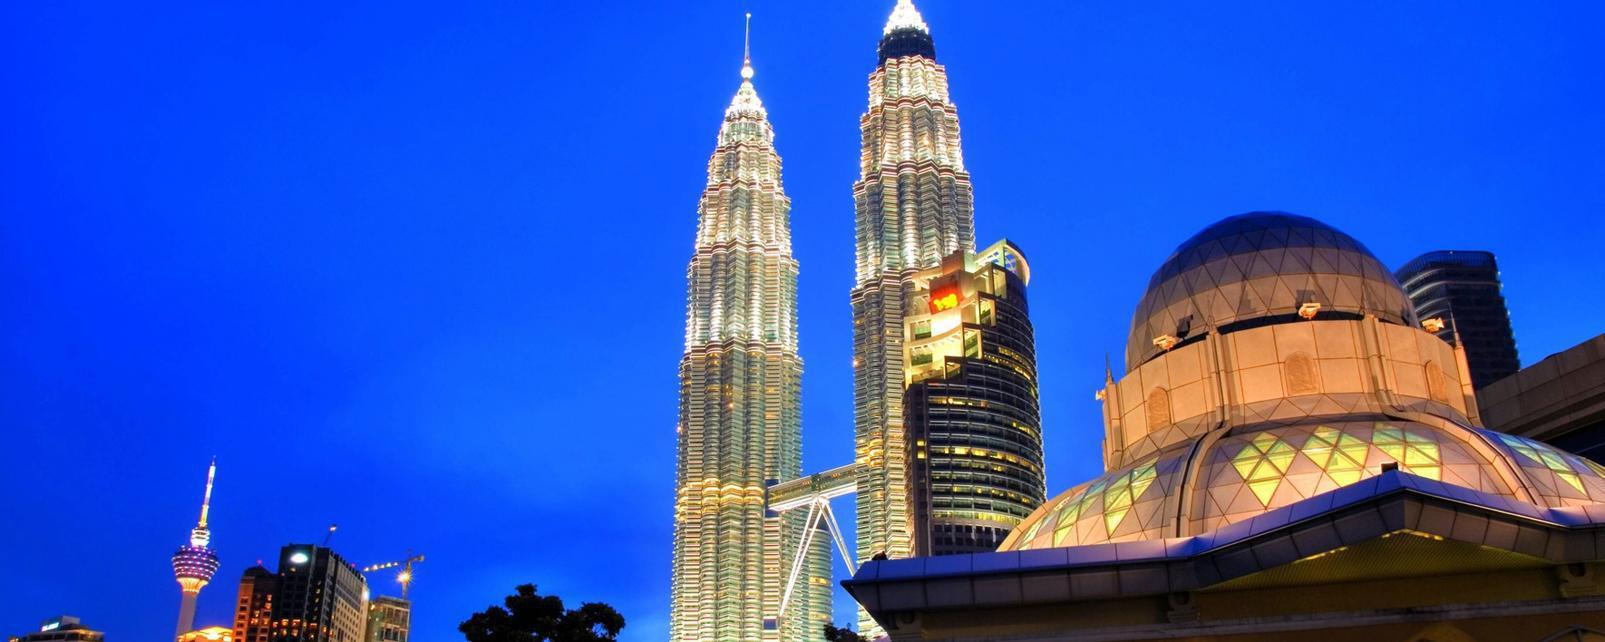 Asie; Malaisie; Malaisie occidentale; Kuala Lumpur;